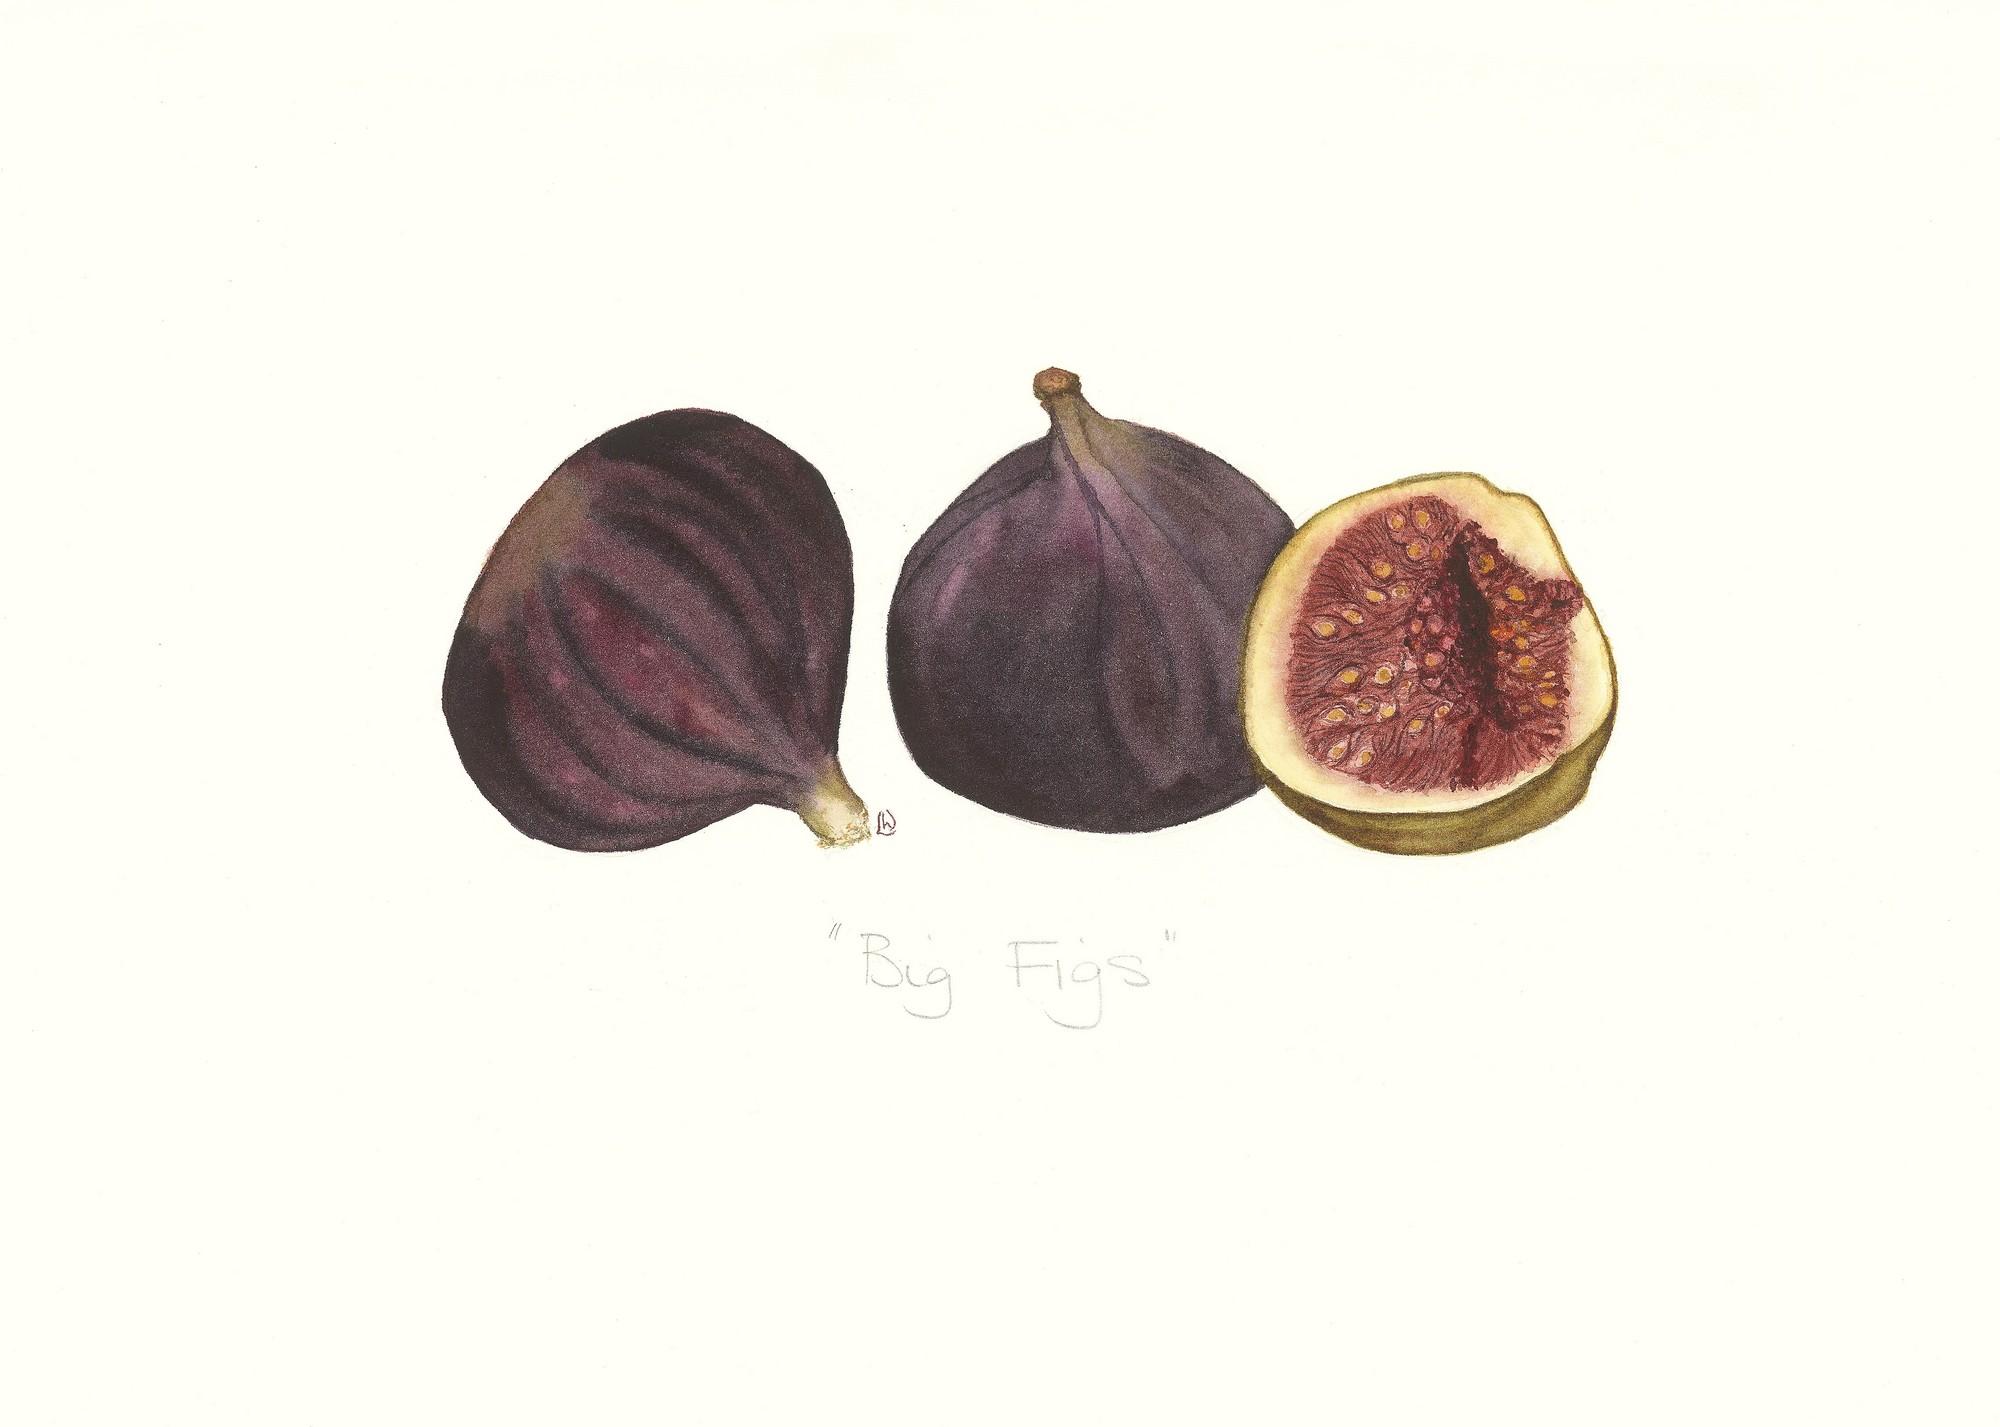 Big Figs, 2012